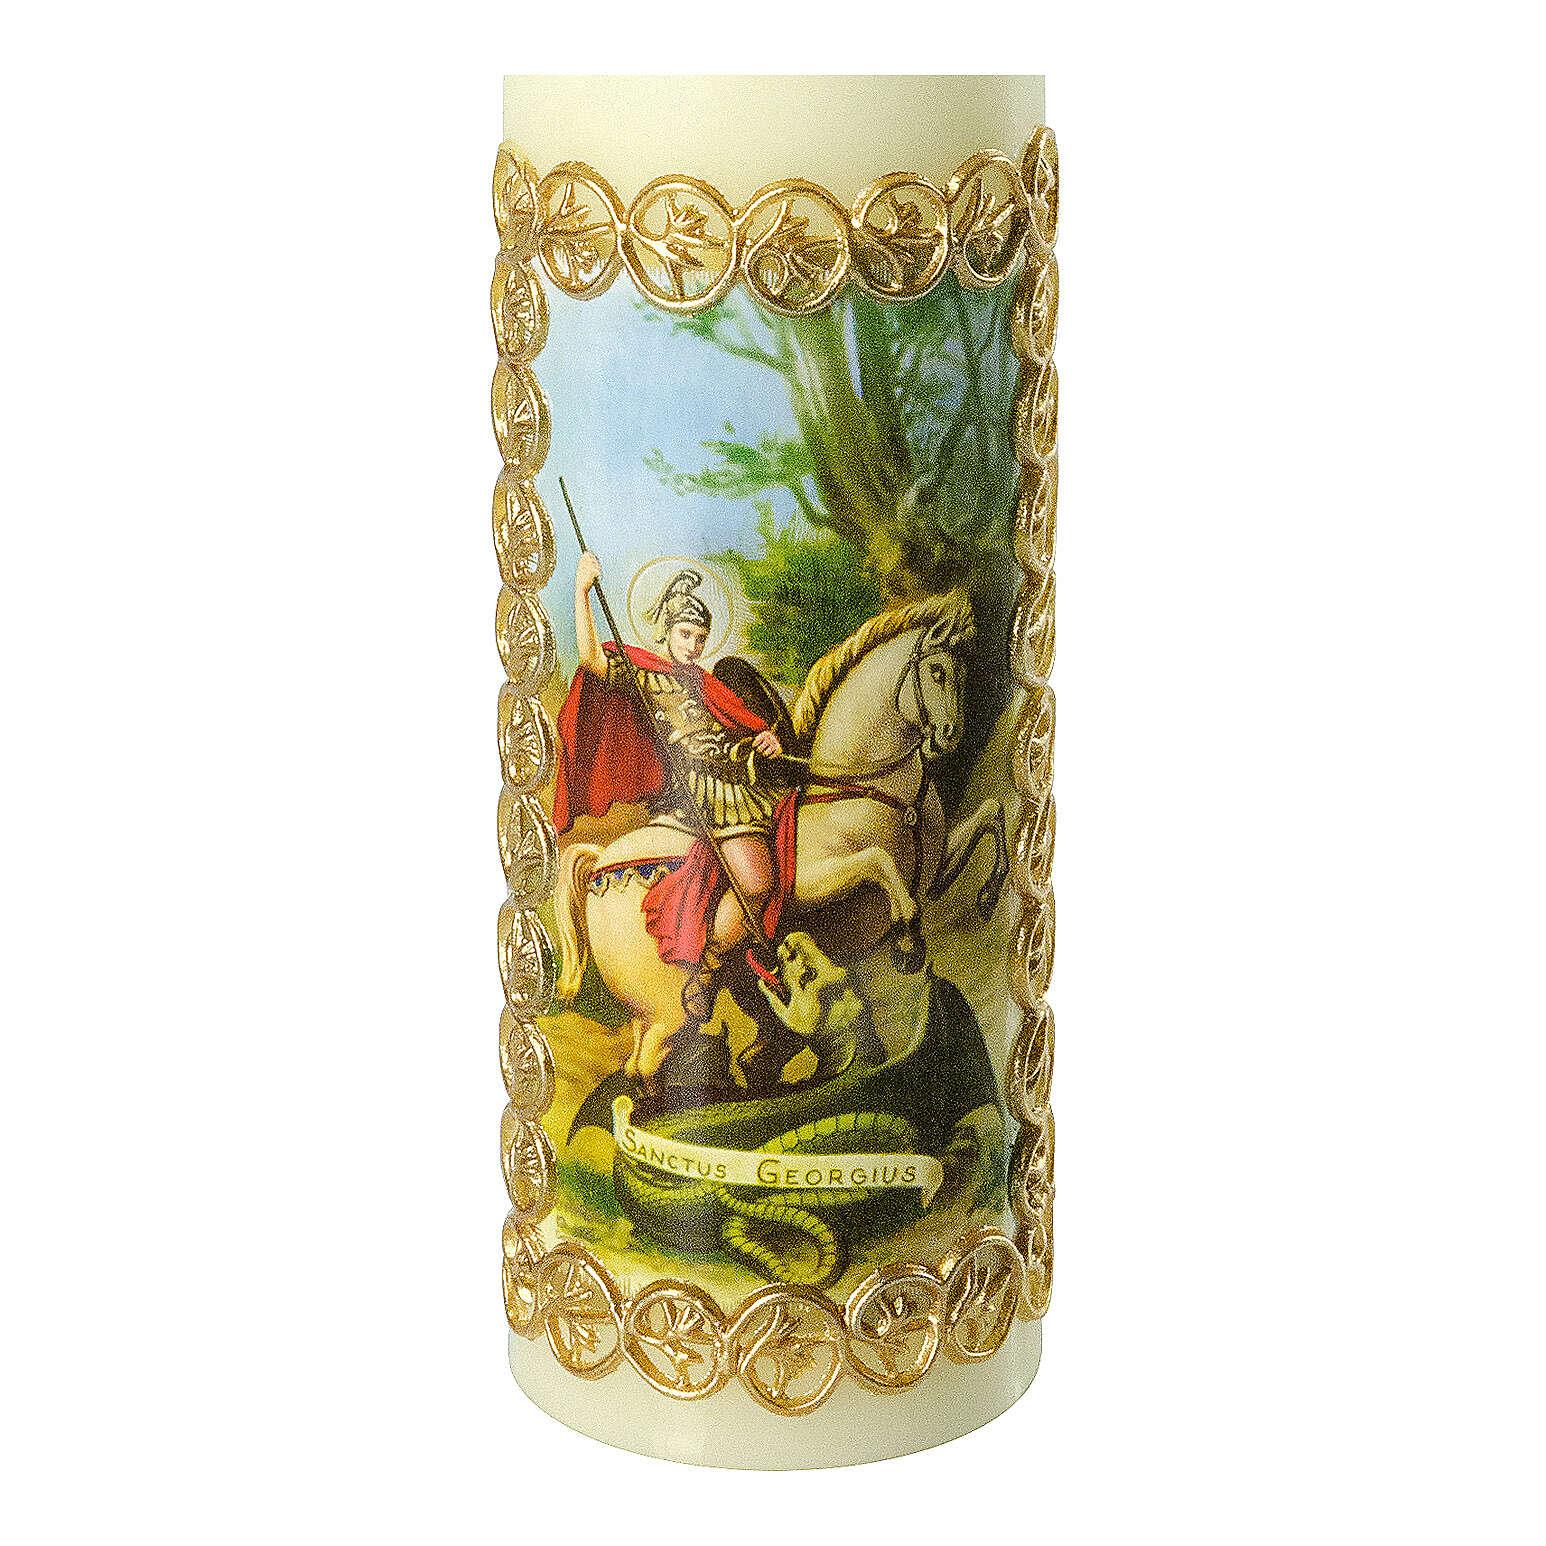 Kerze Heiliger Georg Drachen, 165x50 mm 3